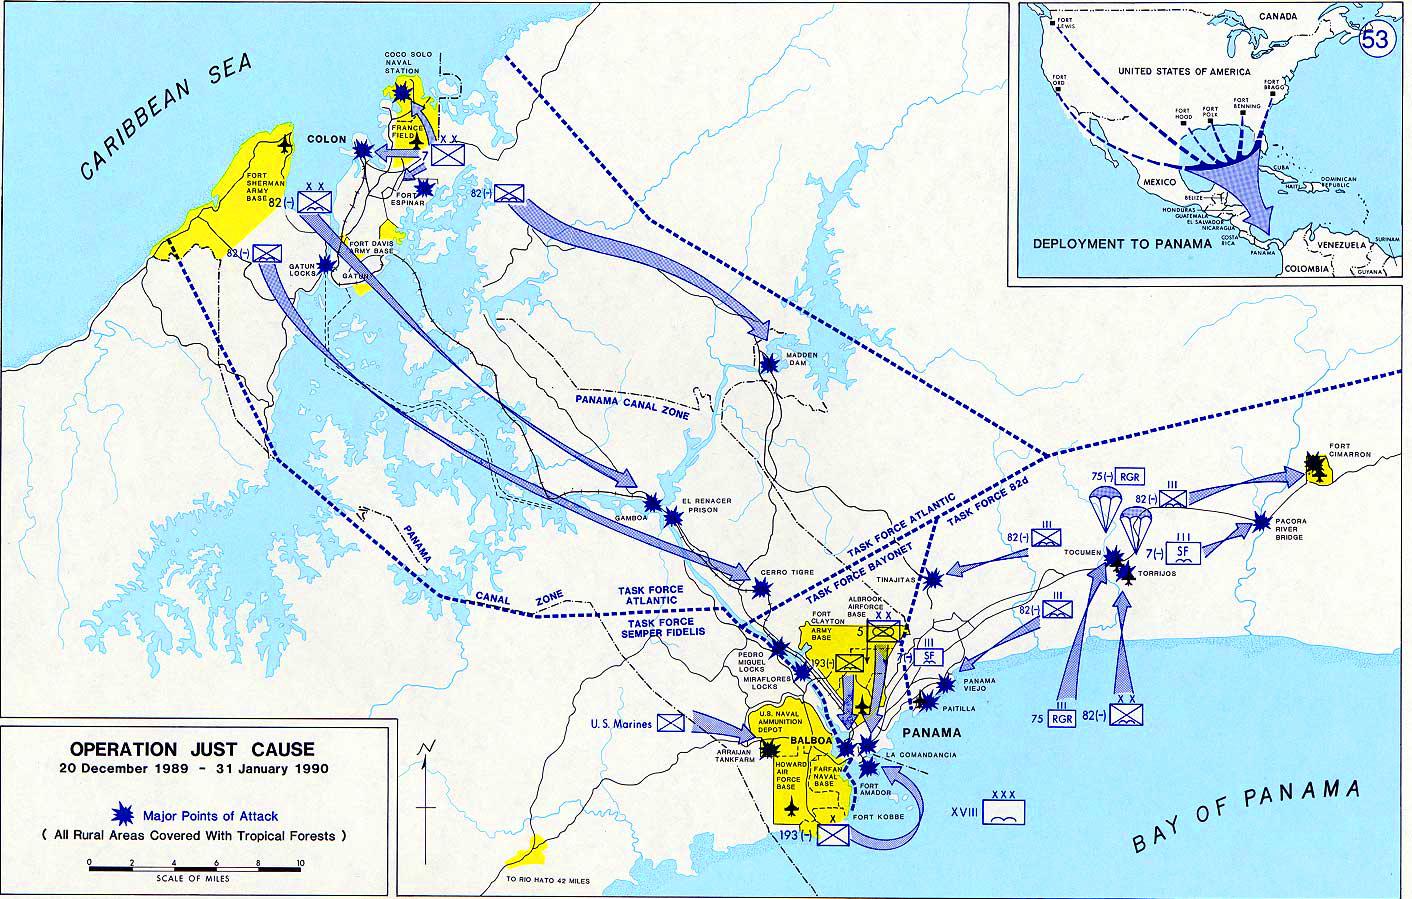 Operación Causa Justa, 20 Diciembre 1989 - 31 de enero 1990